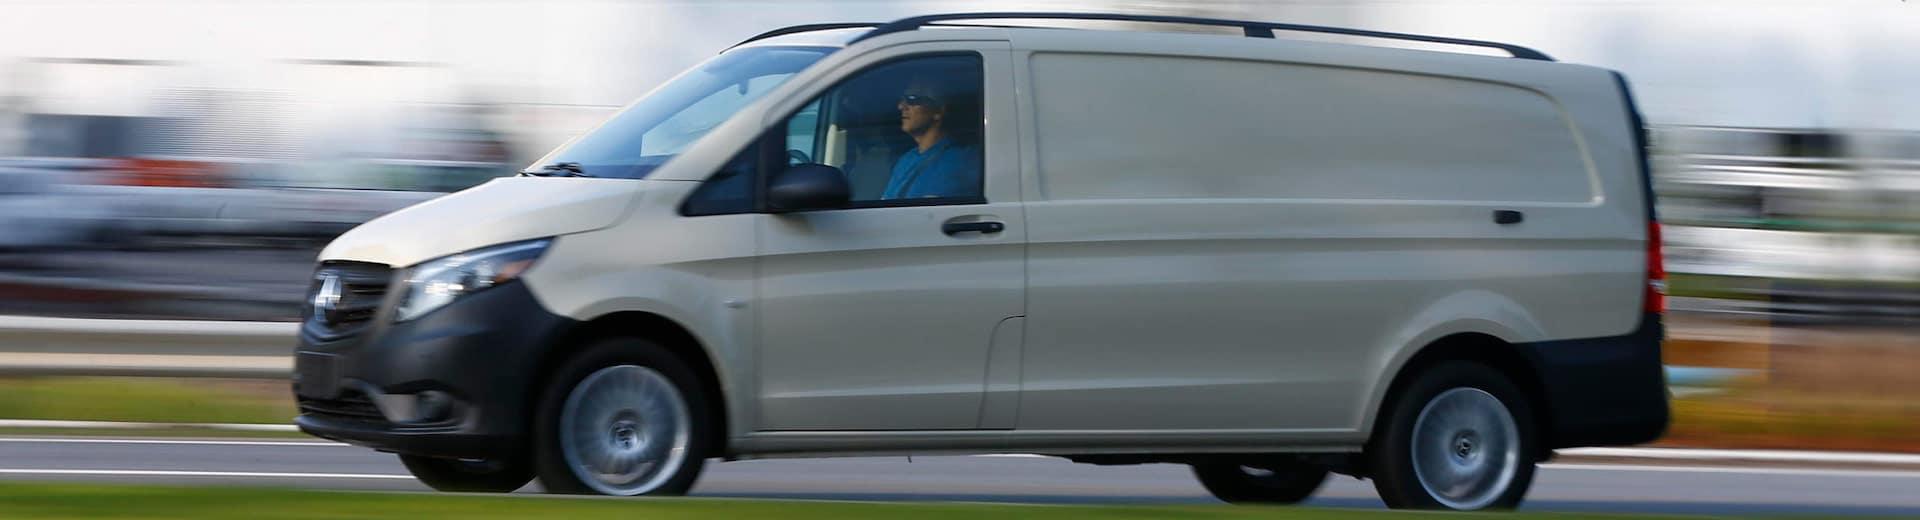 Metris Van Driving Down the Road